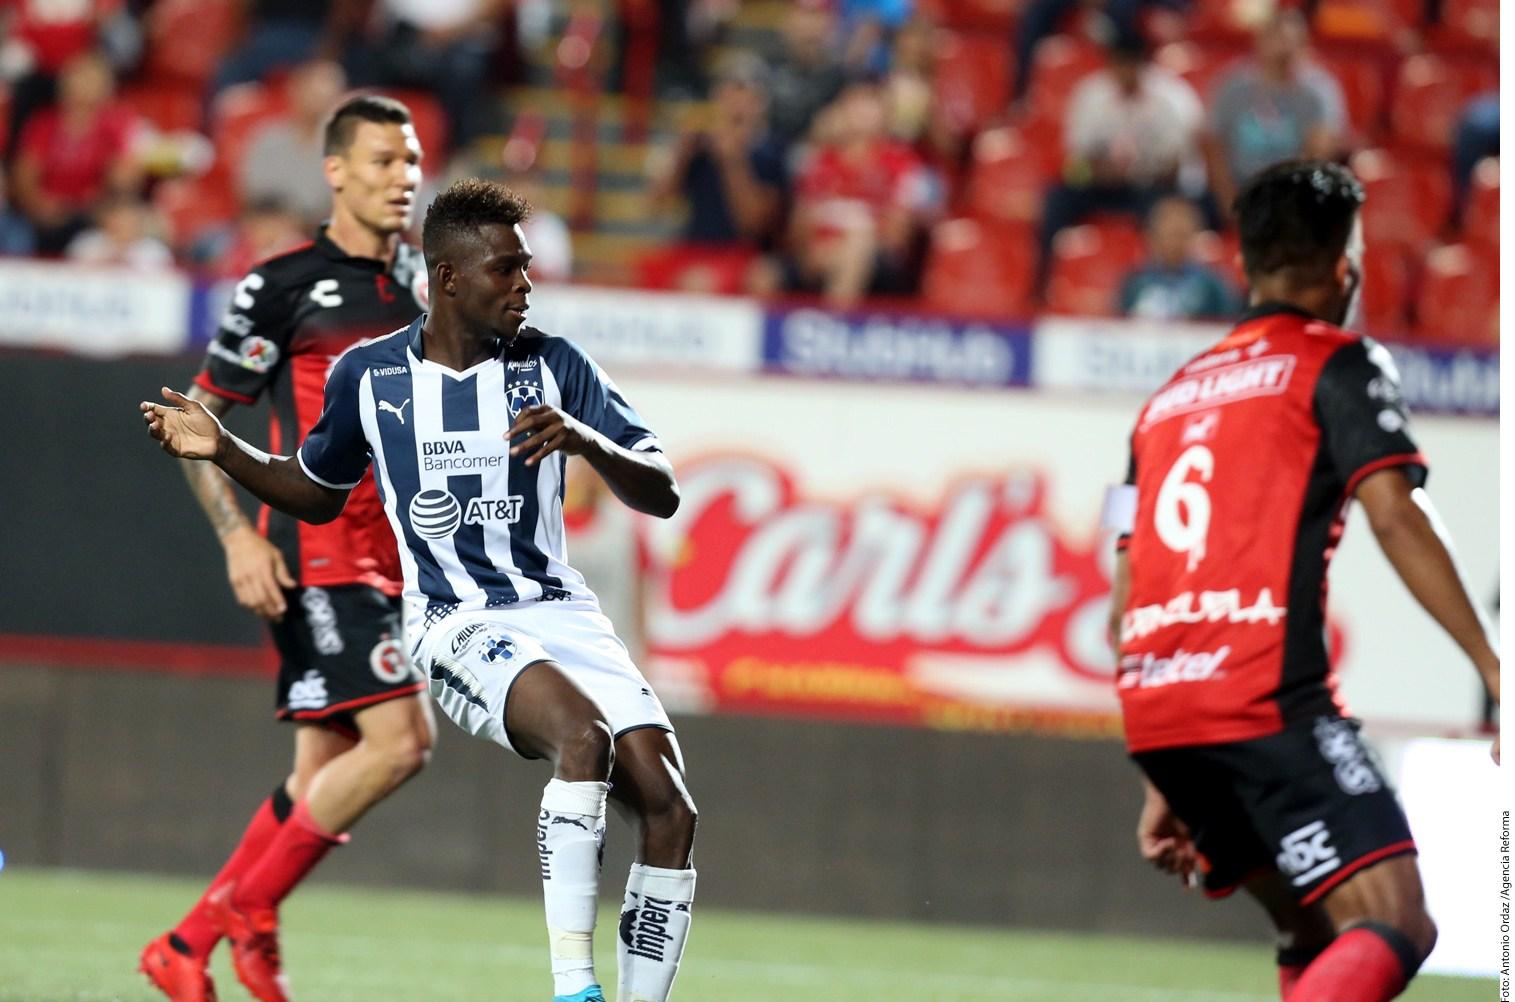 Da Sorpresa, Cuartos de Final, Clausura 2018, Estadio BBVA, Xolos, Tijuana, Elimina, Monterrey, Rayados, Goles, Semifinales